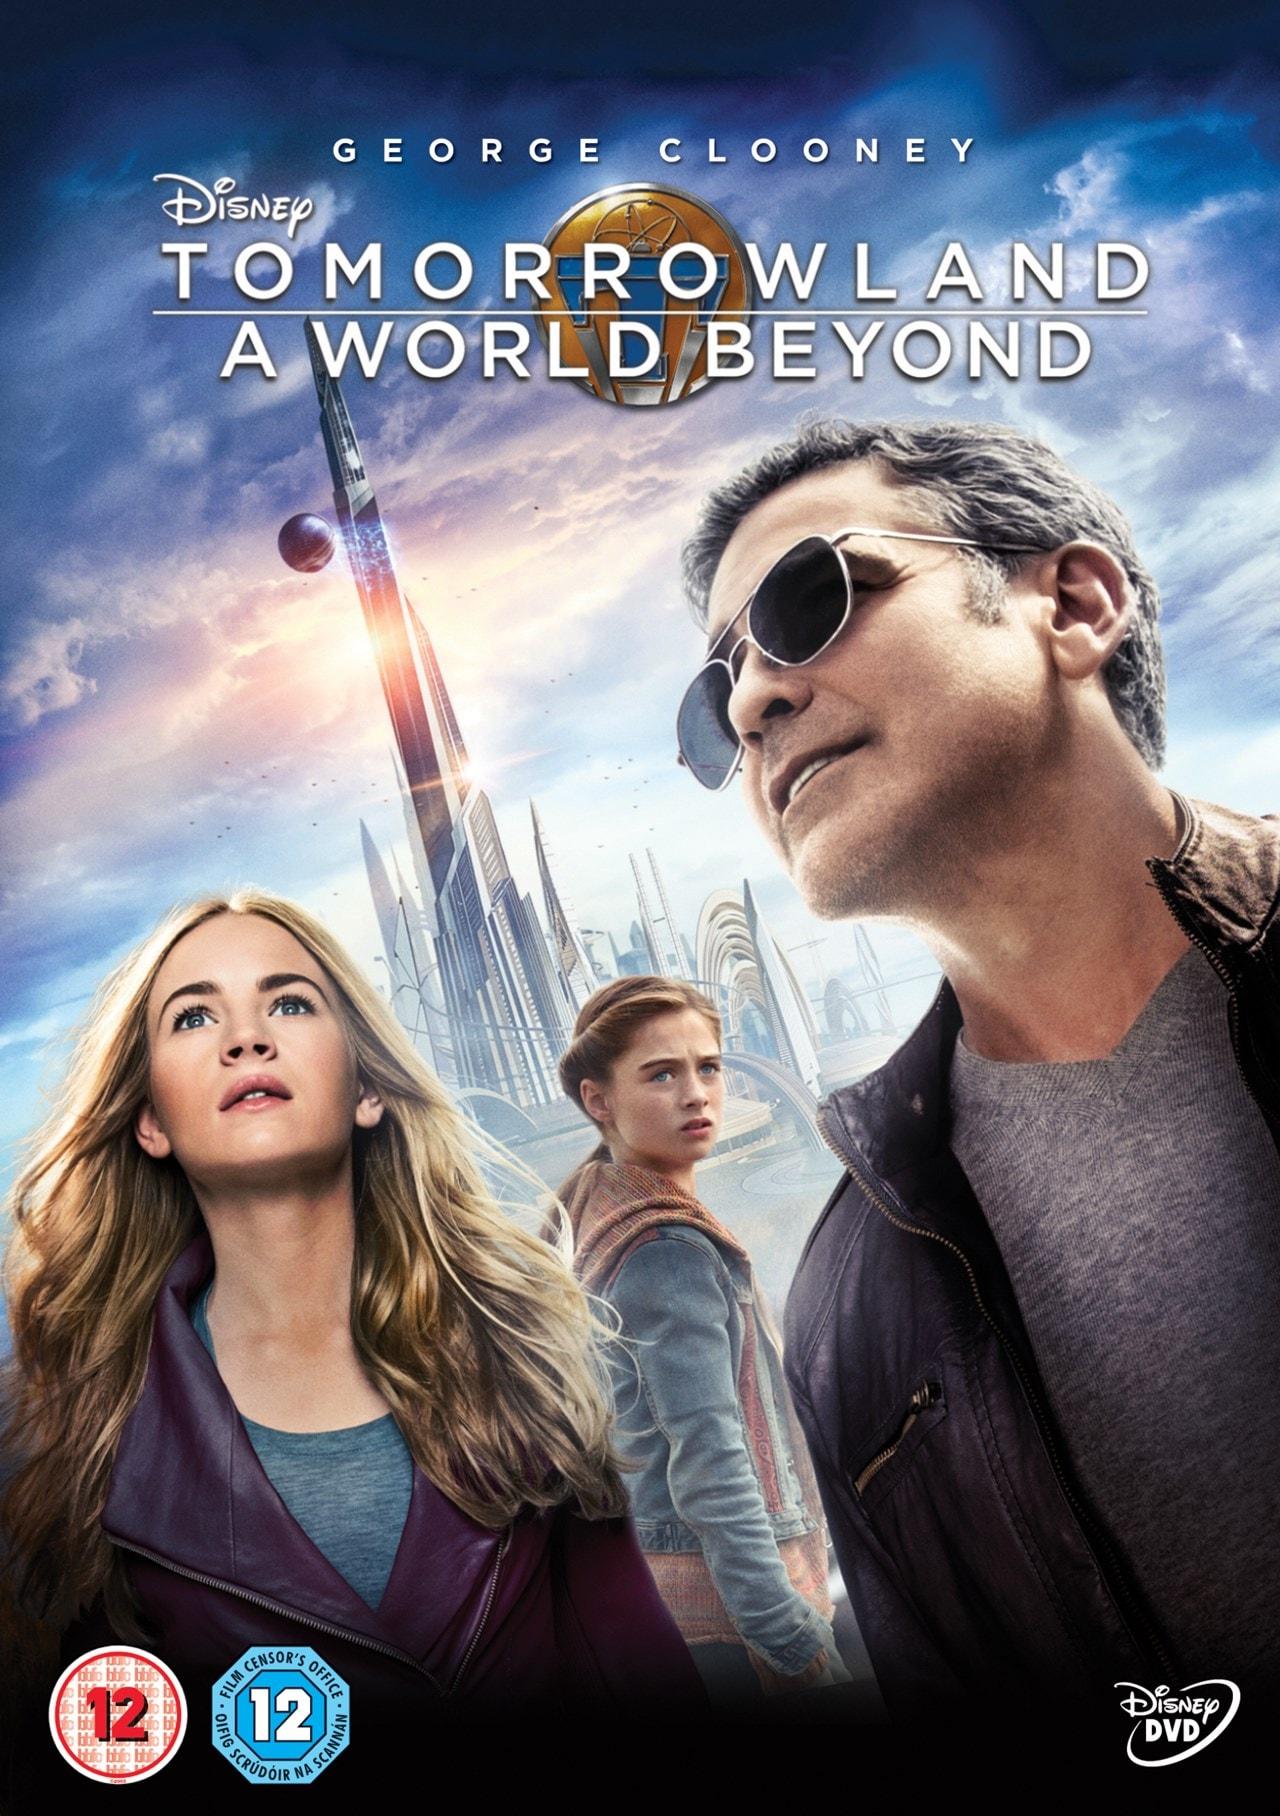 Tomorrowland - A World Beyond - 1